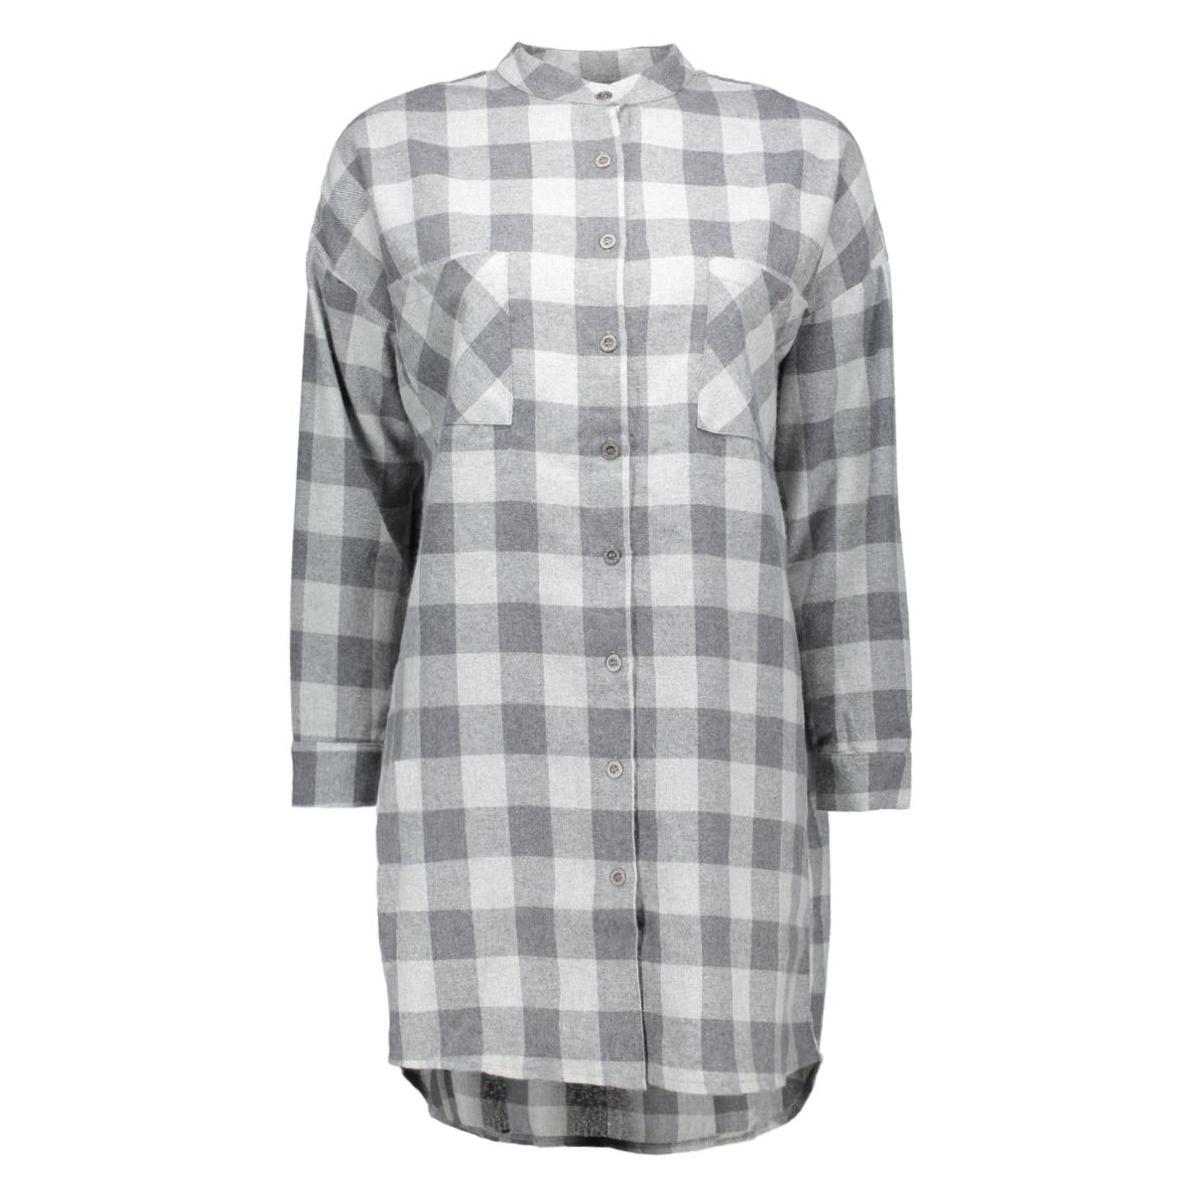 w16.70.3025 elin blouse circle of trust blouse grey melange